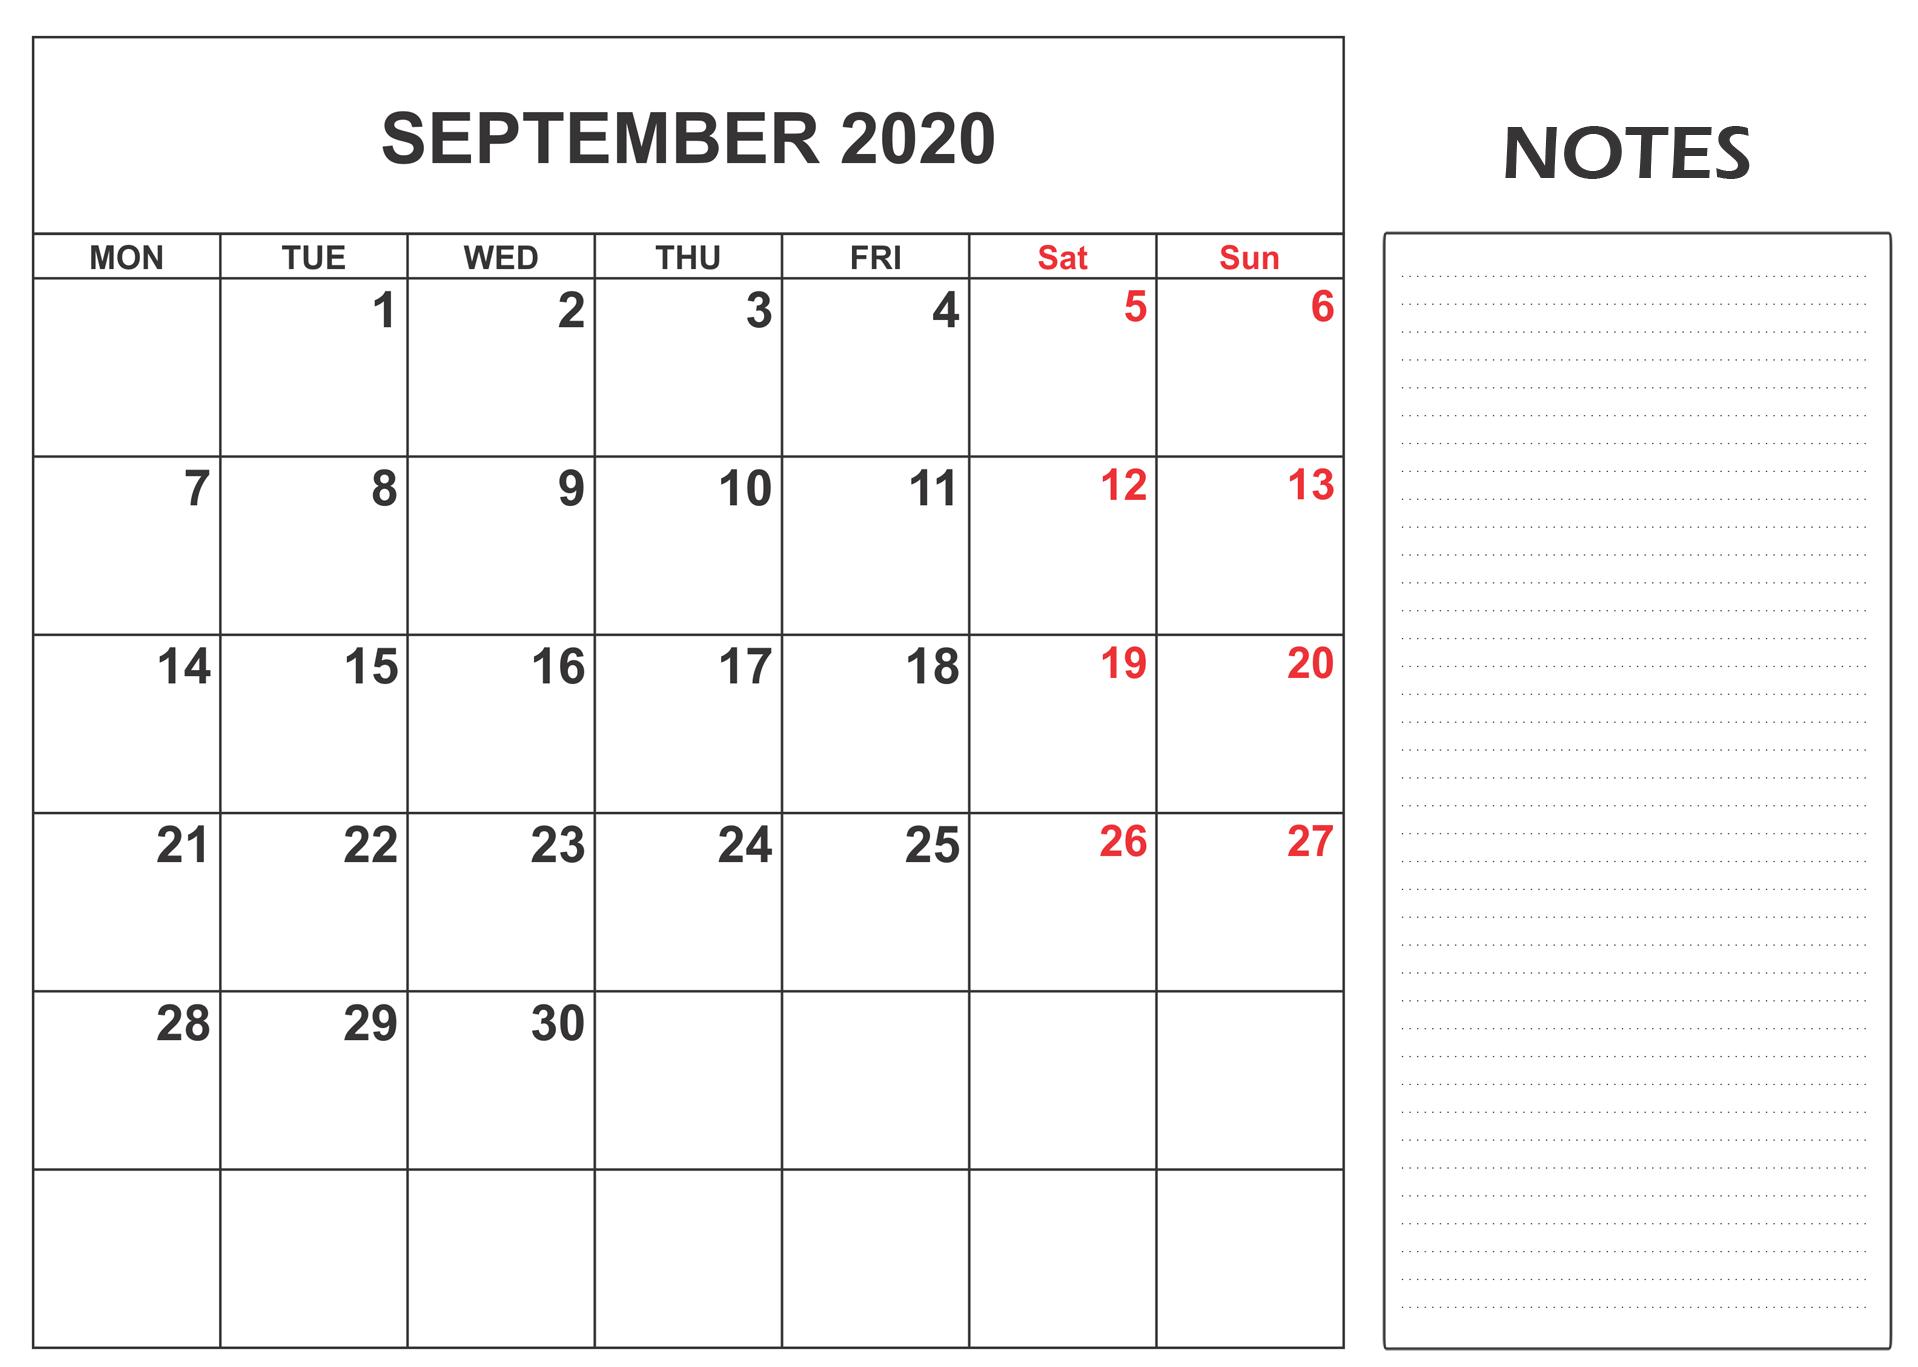 September Calendar 2020 Notes